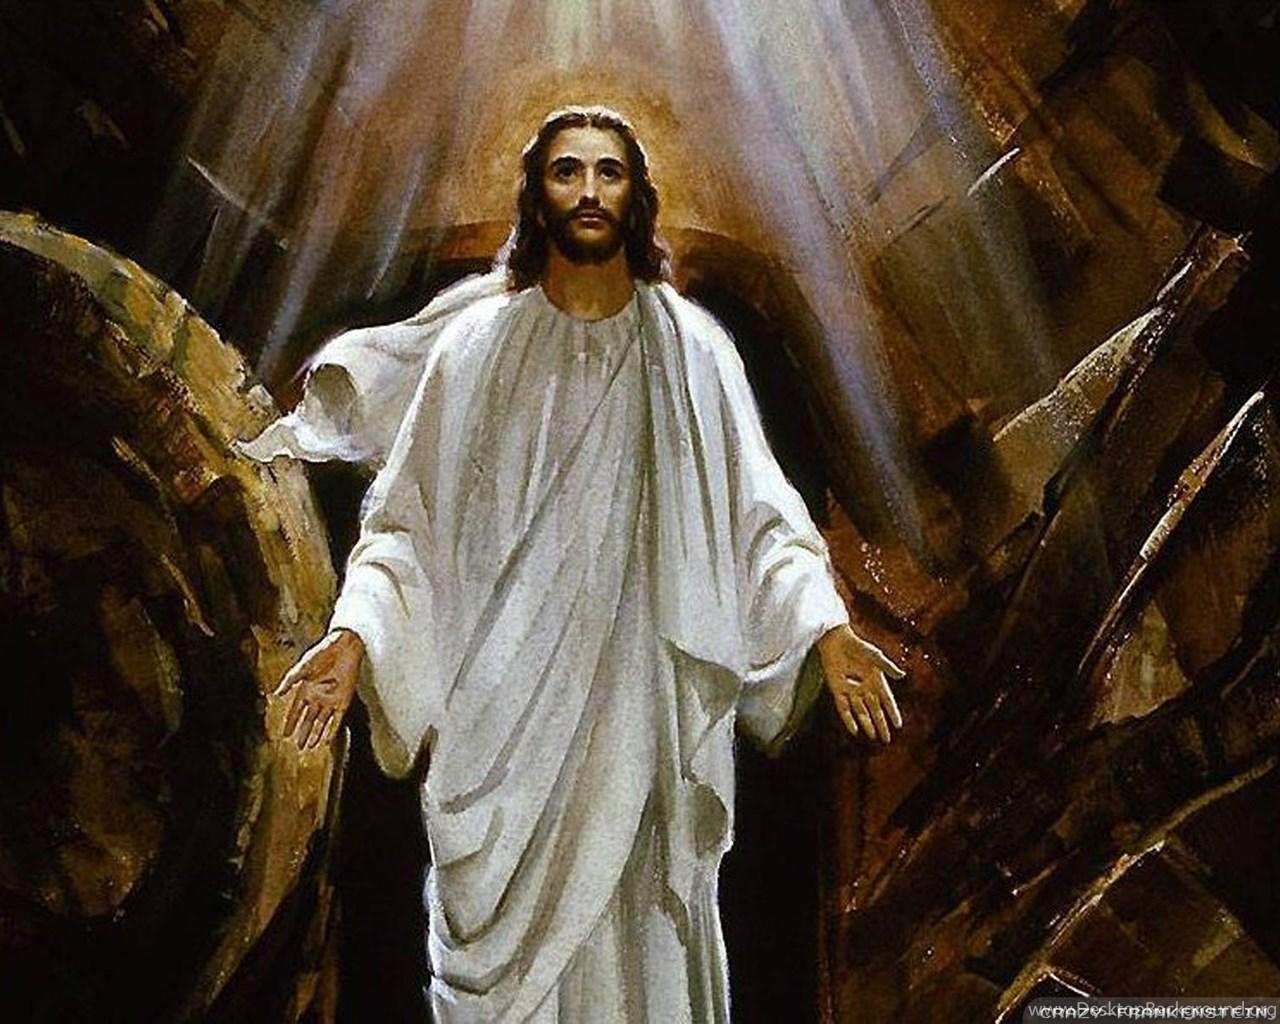 Jesus Christ Wallpapers Picture For Download Download Desktop Background